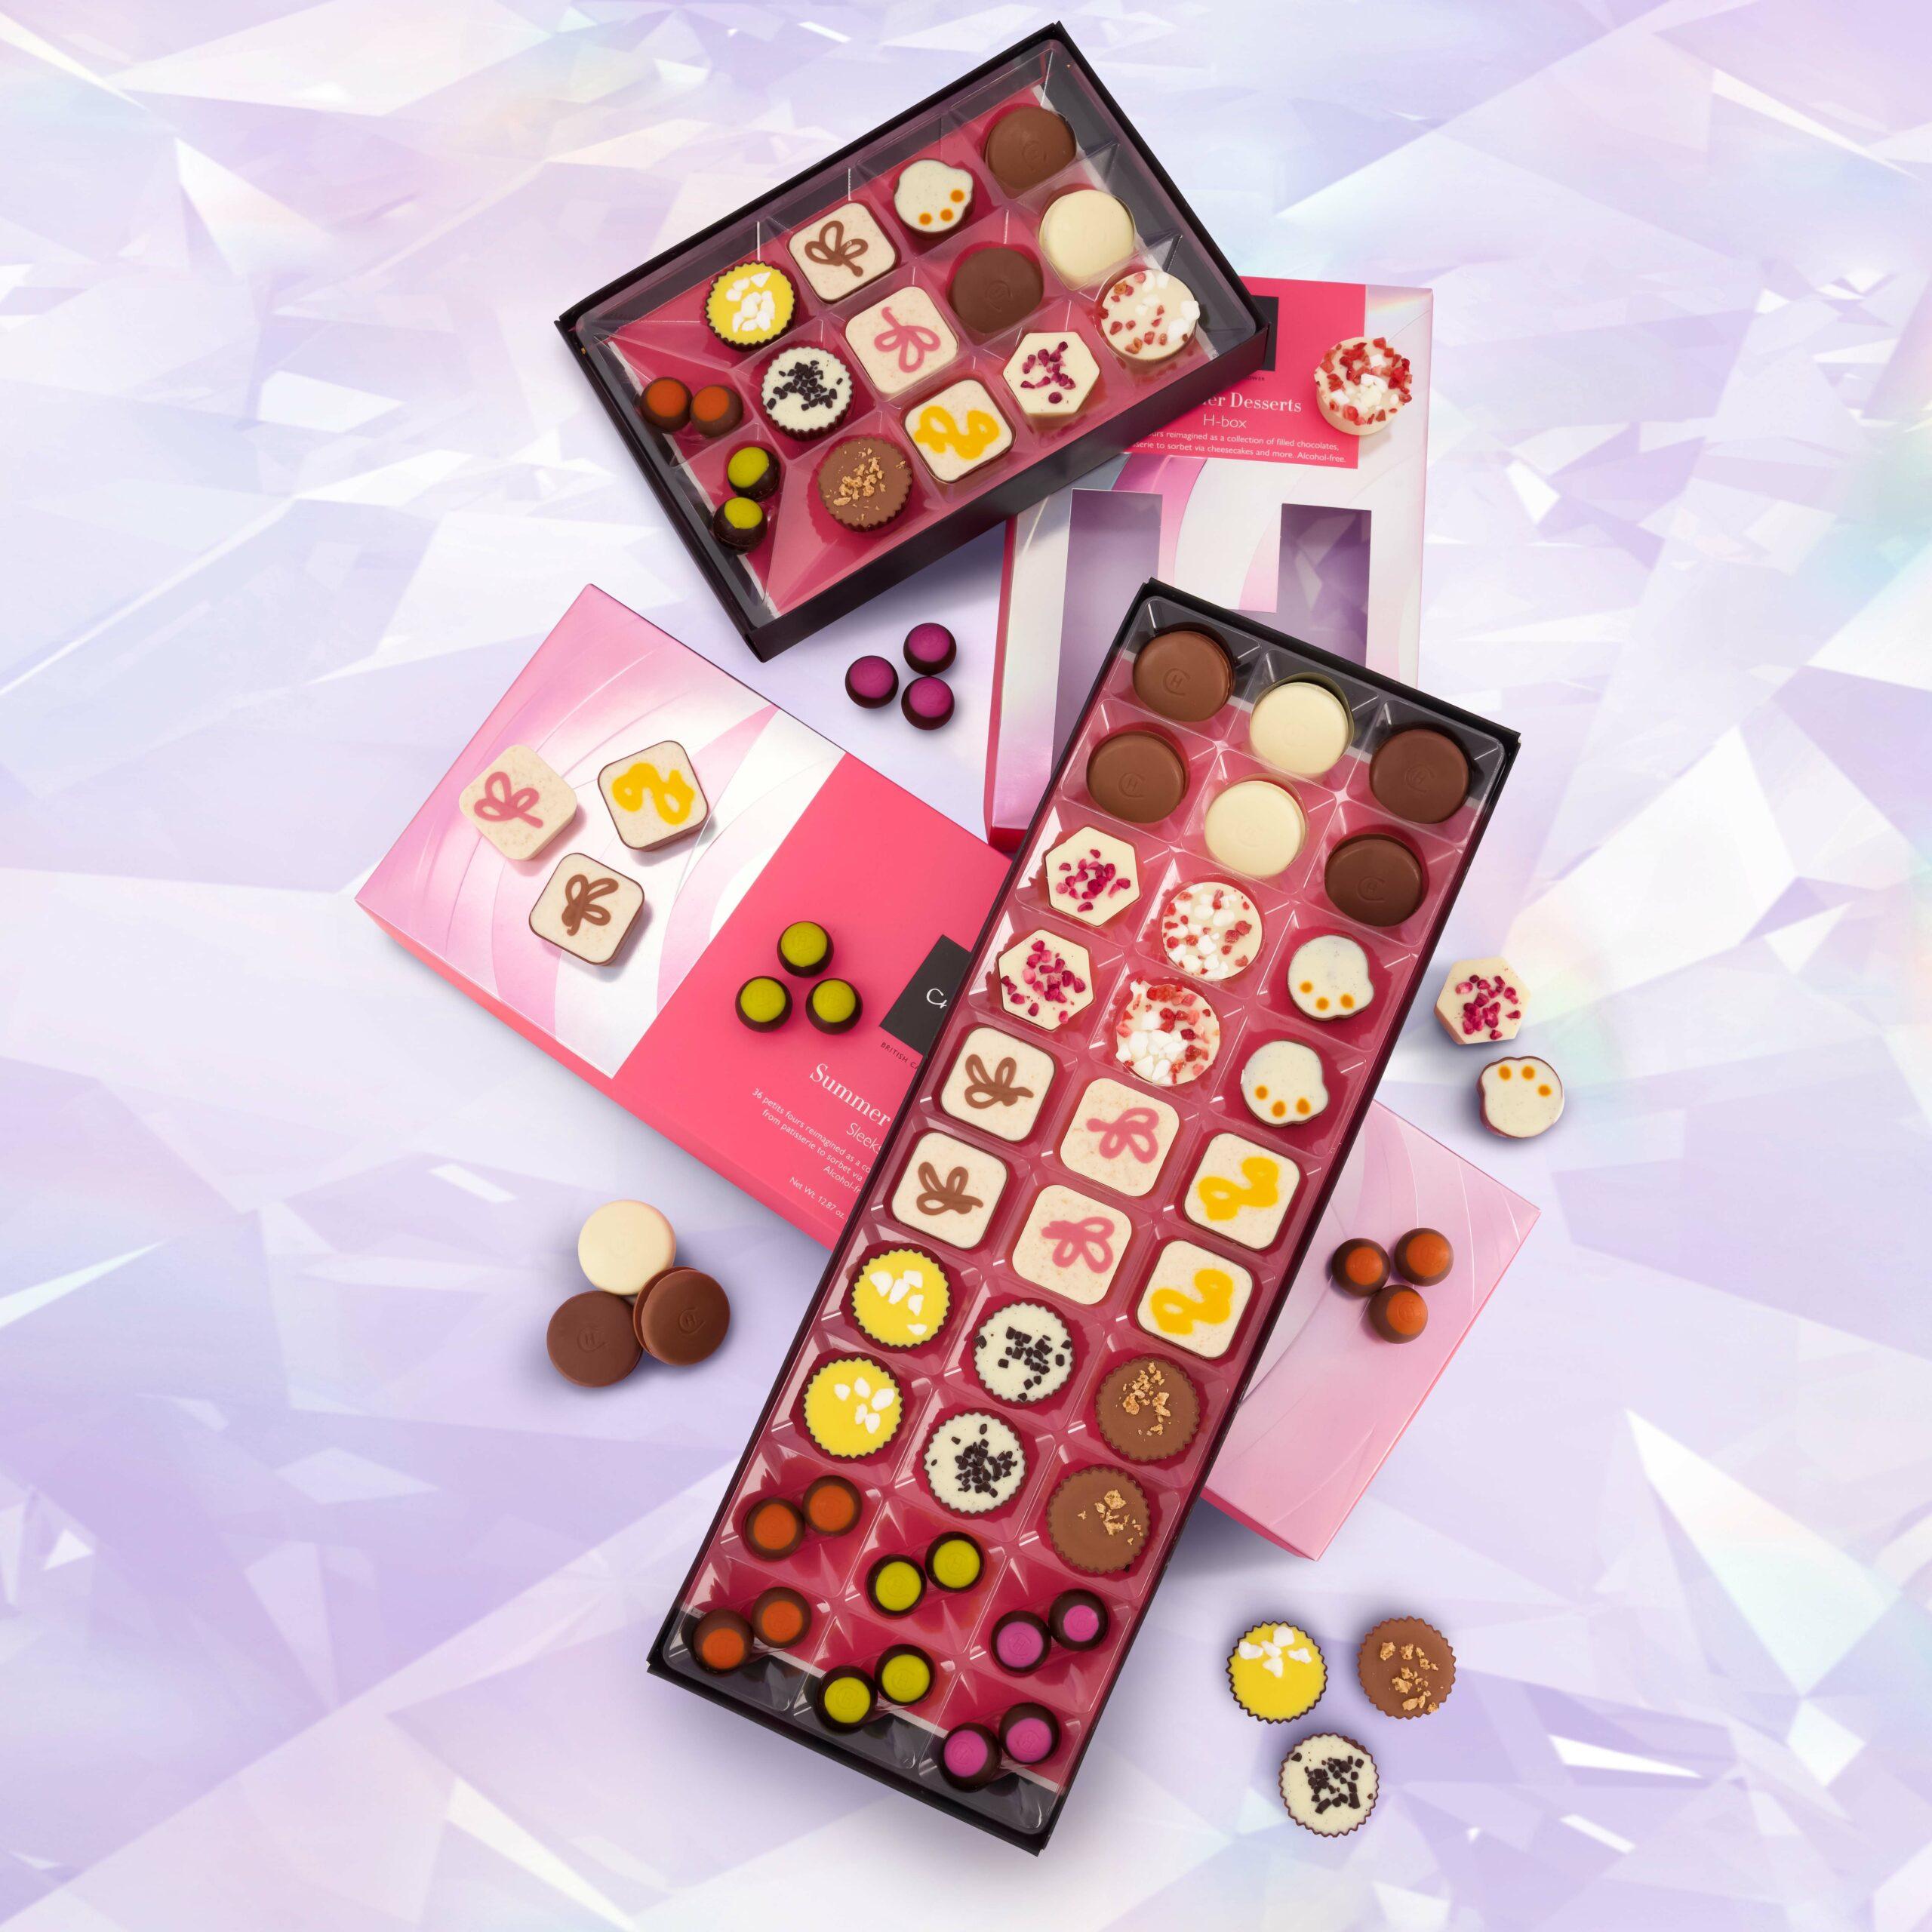 Win Hotel Chocolat Ultimate Chocolate Prize